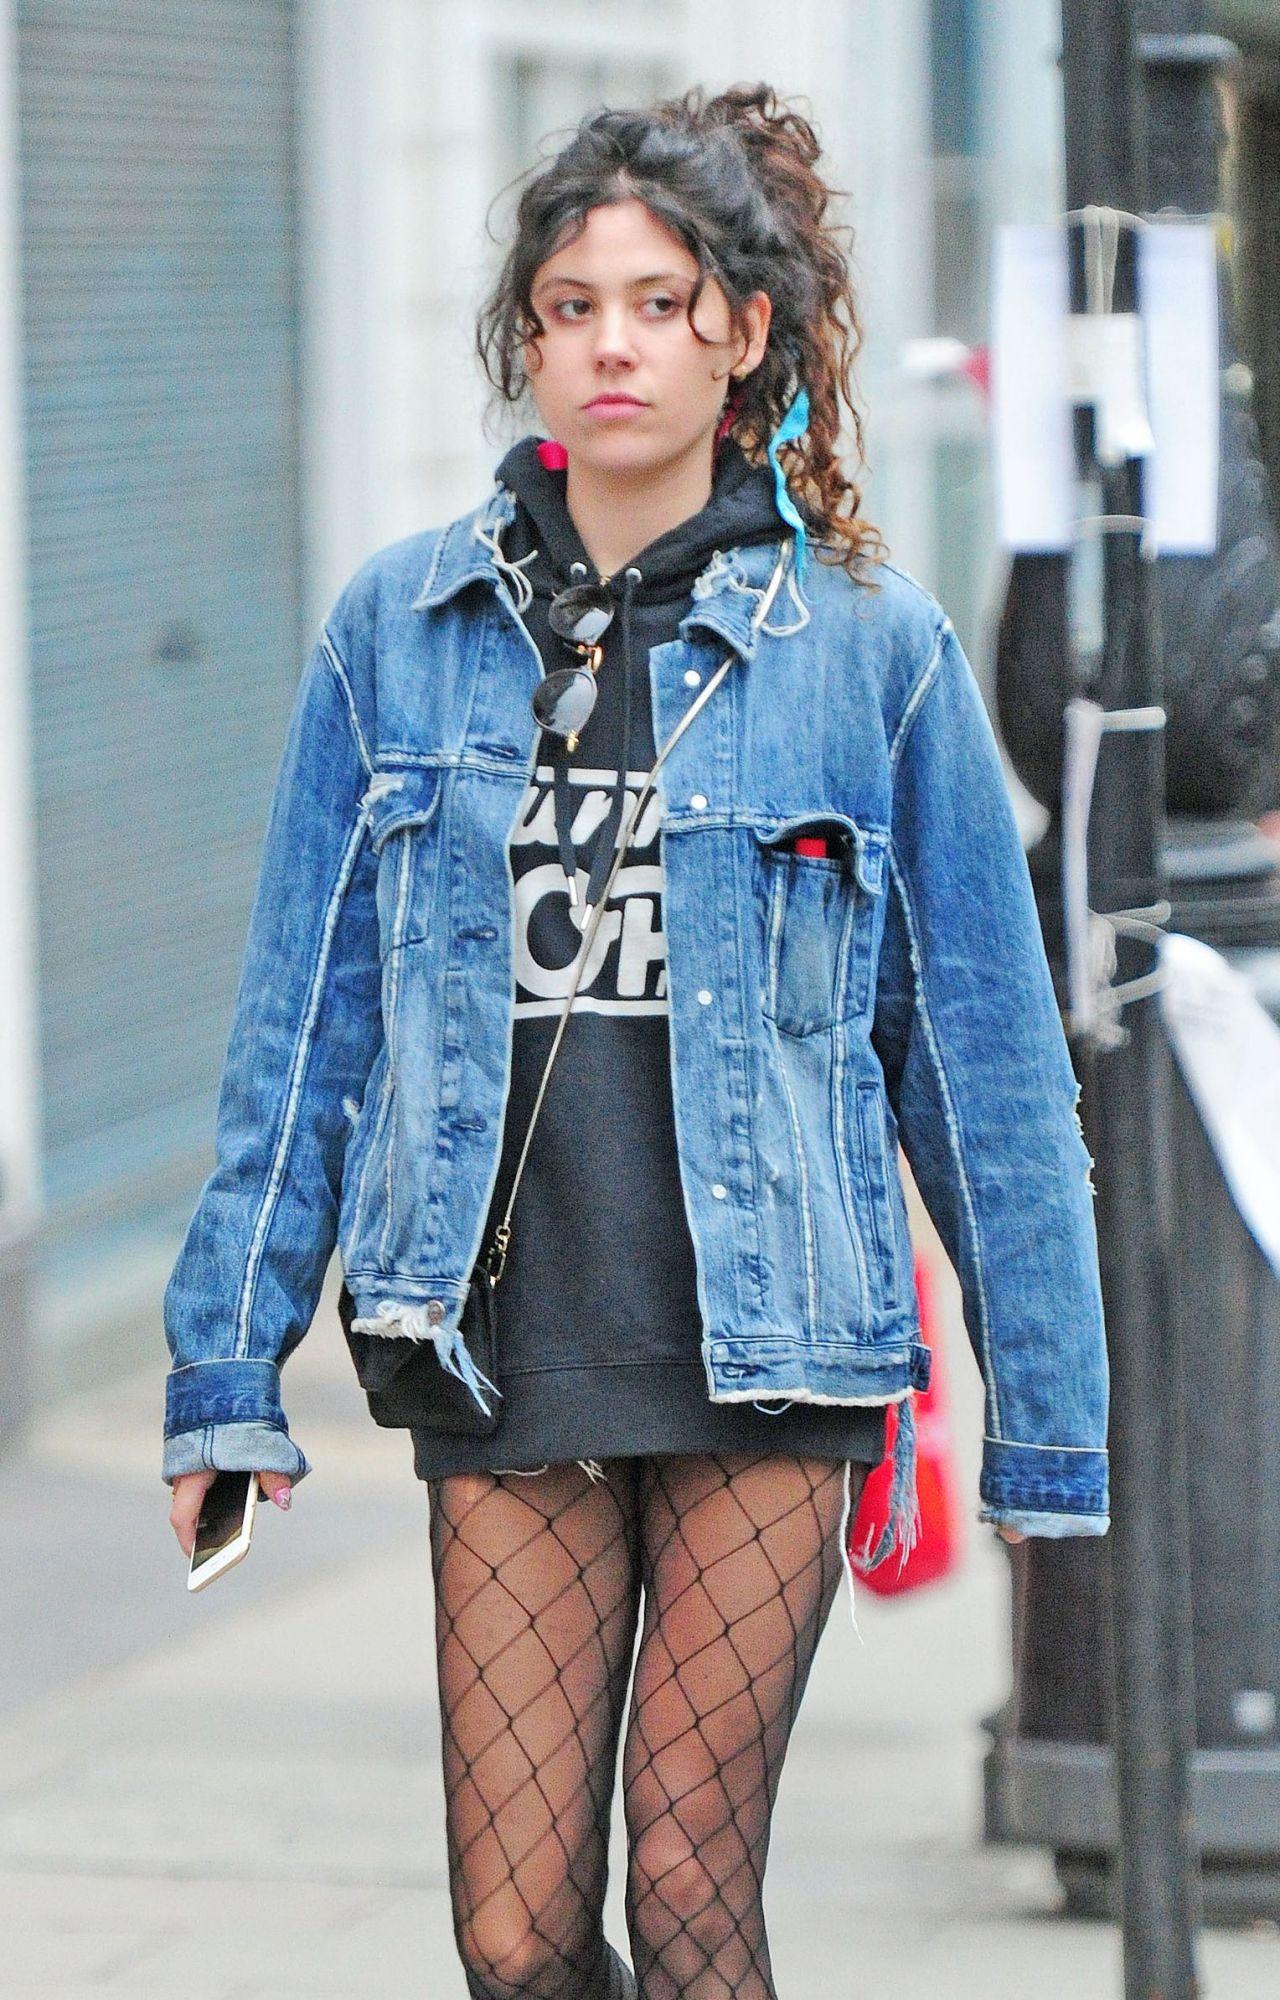 Eliza Doolittle Wearing Stockings -  Out in Primrose Hill - Oct. 2014